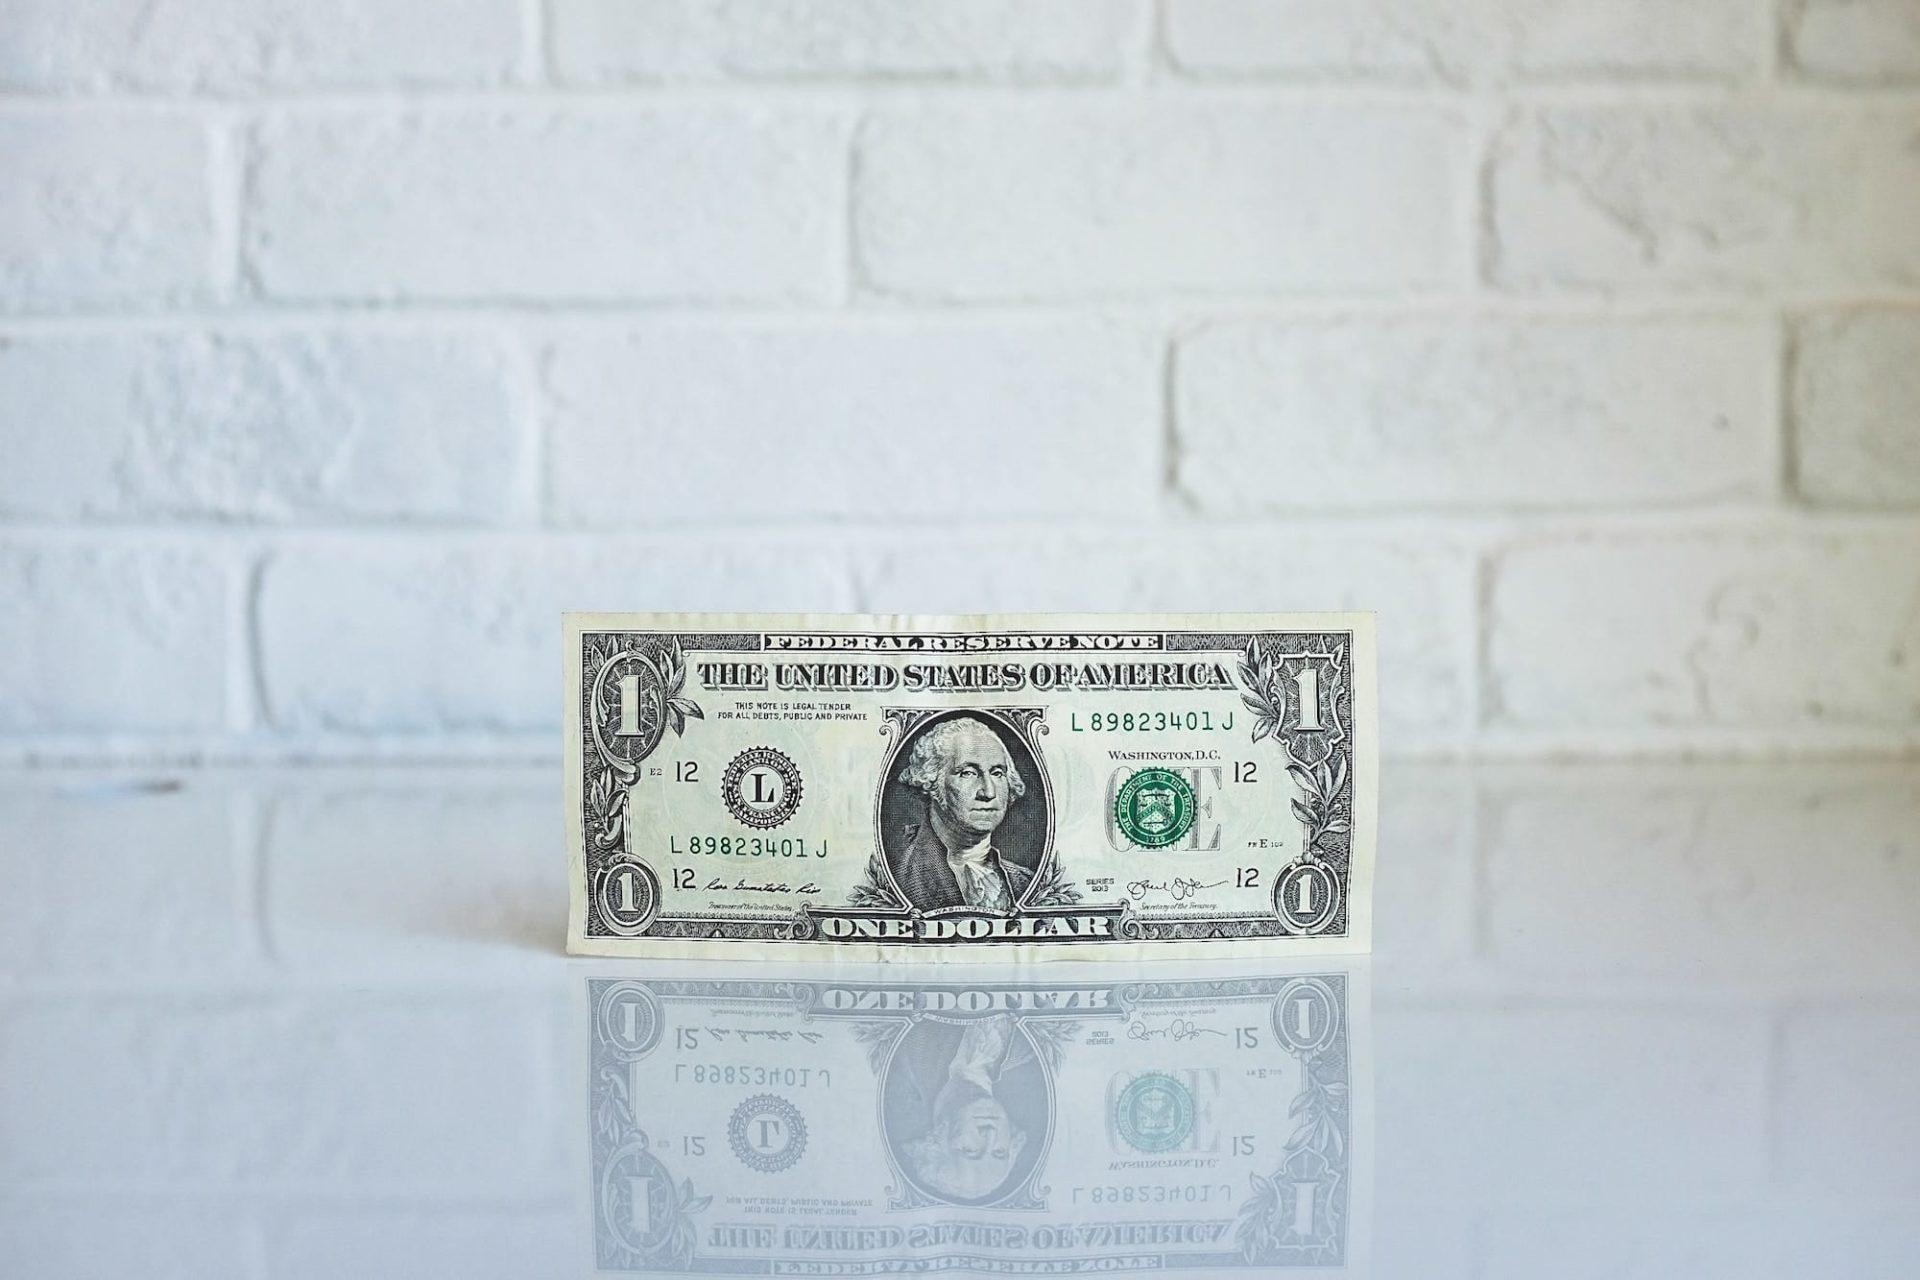 Dollar bill on table.